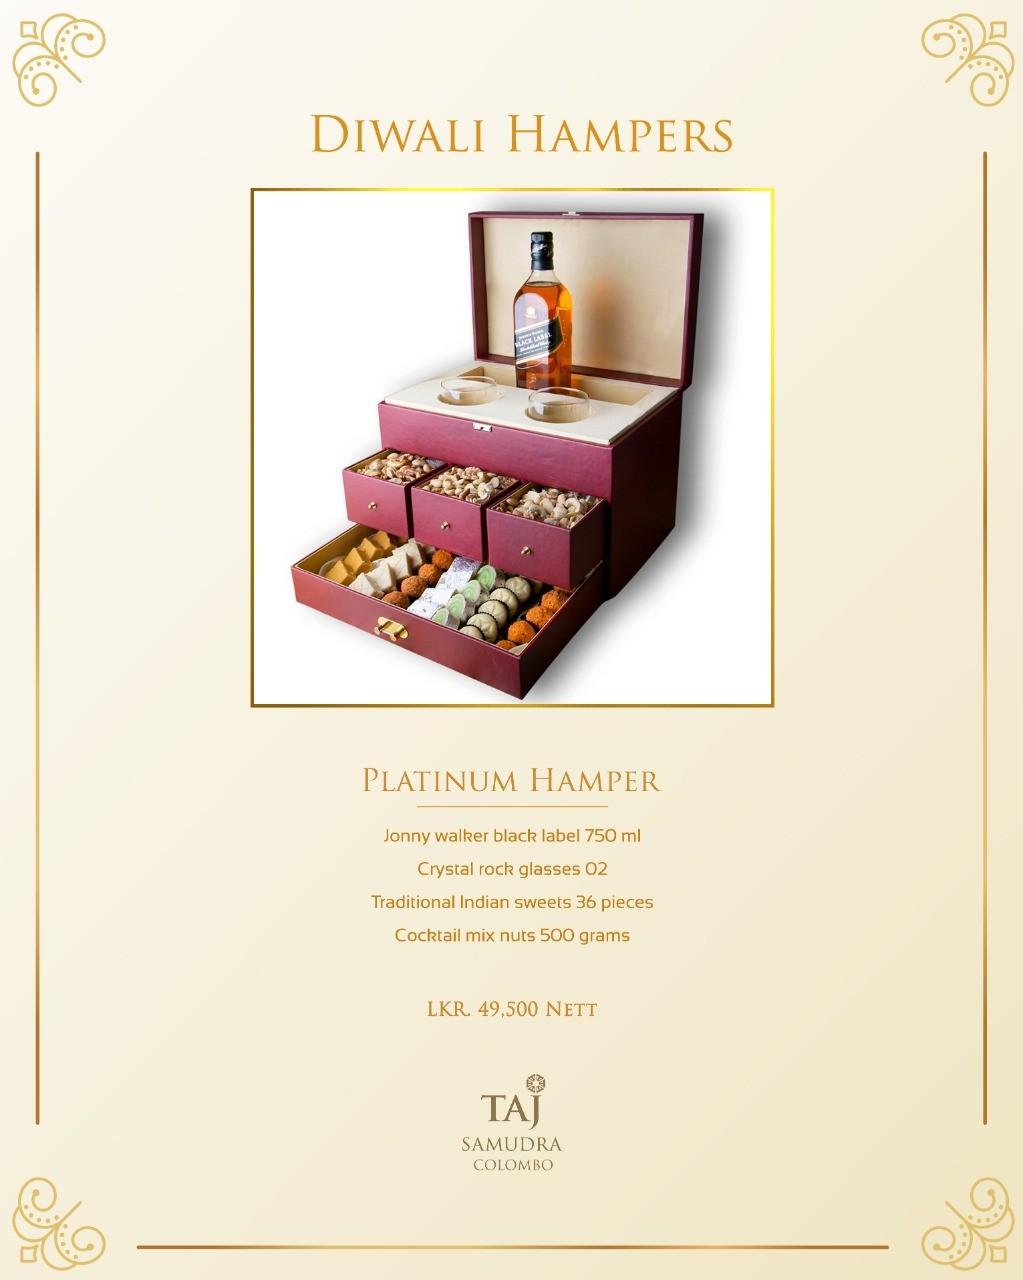 TAJ DIWALI SWEETS AND HAMPERS